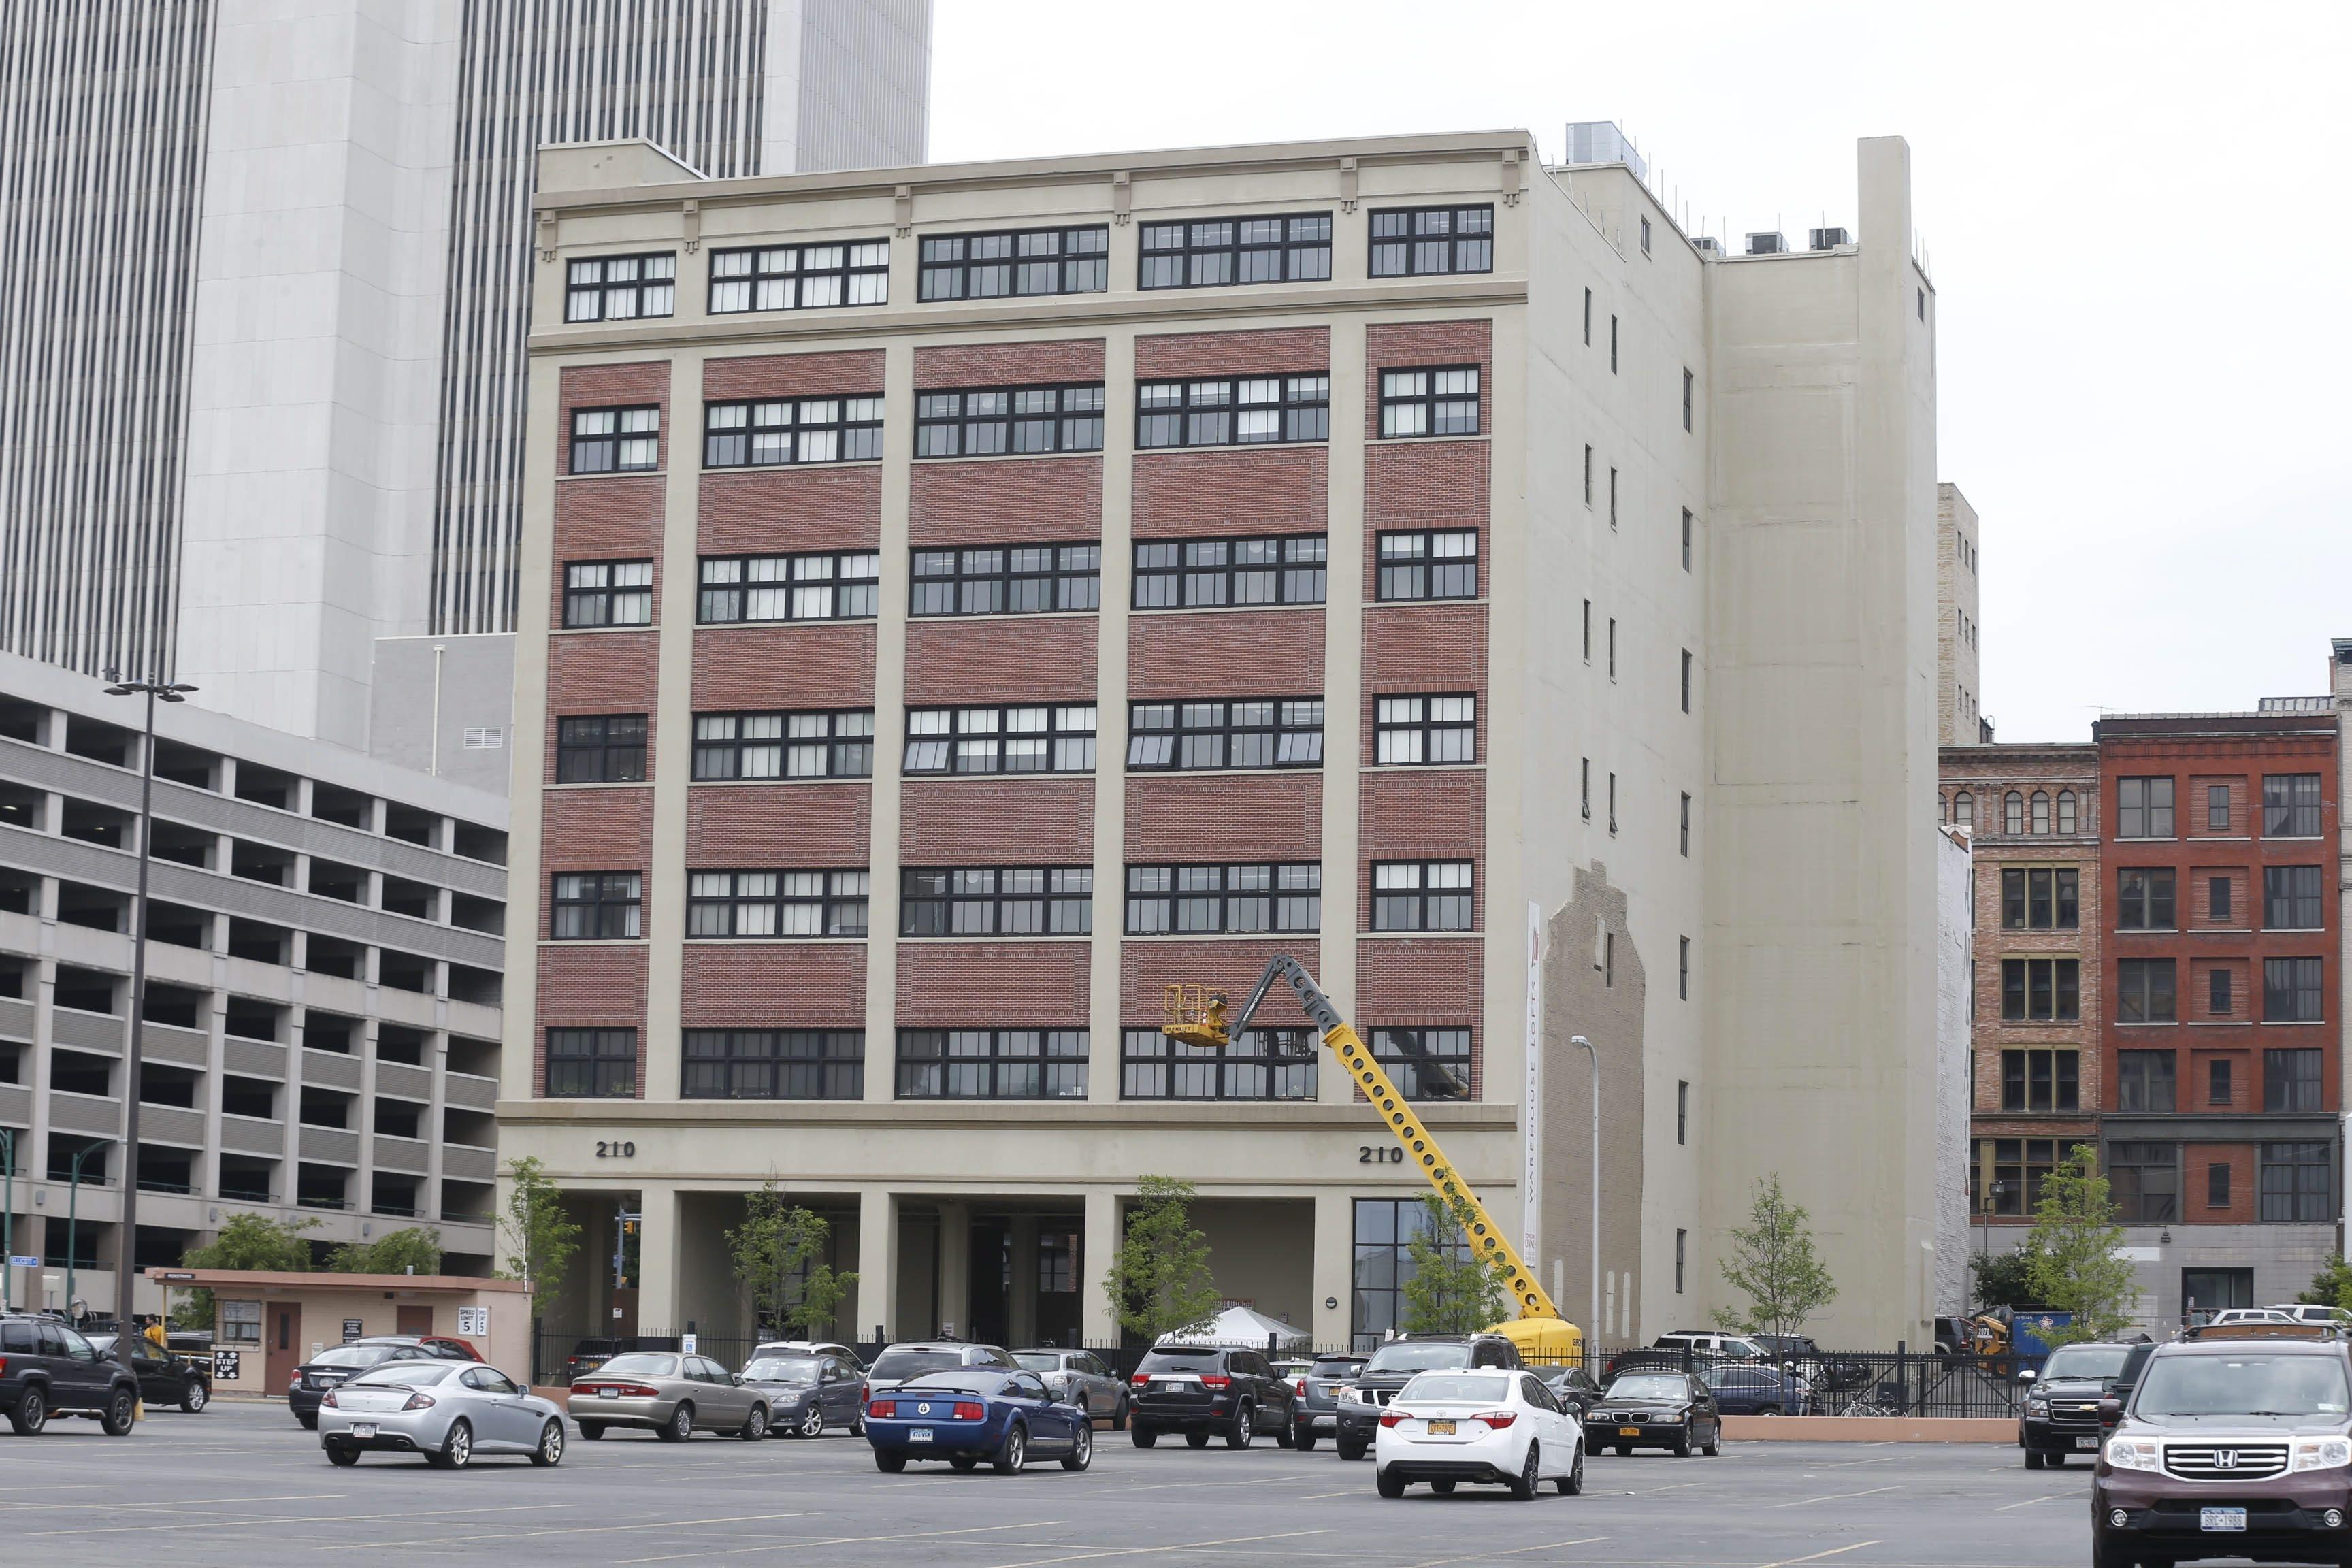 Warehouse Lofts Condominiums at 210 Ellicott St. in Buffalo.   (Robert Kirkham/Buffalo News)